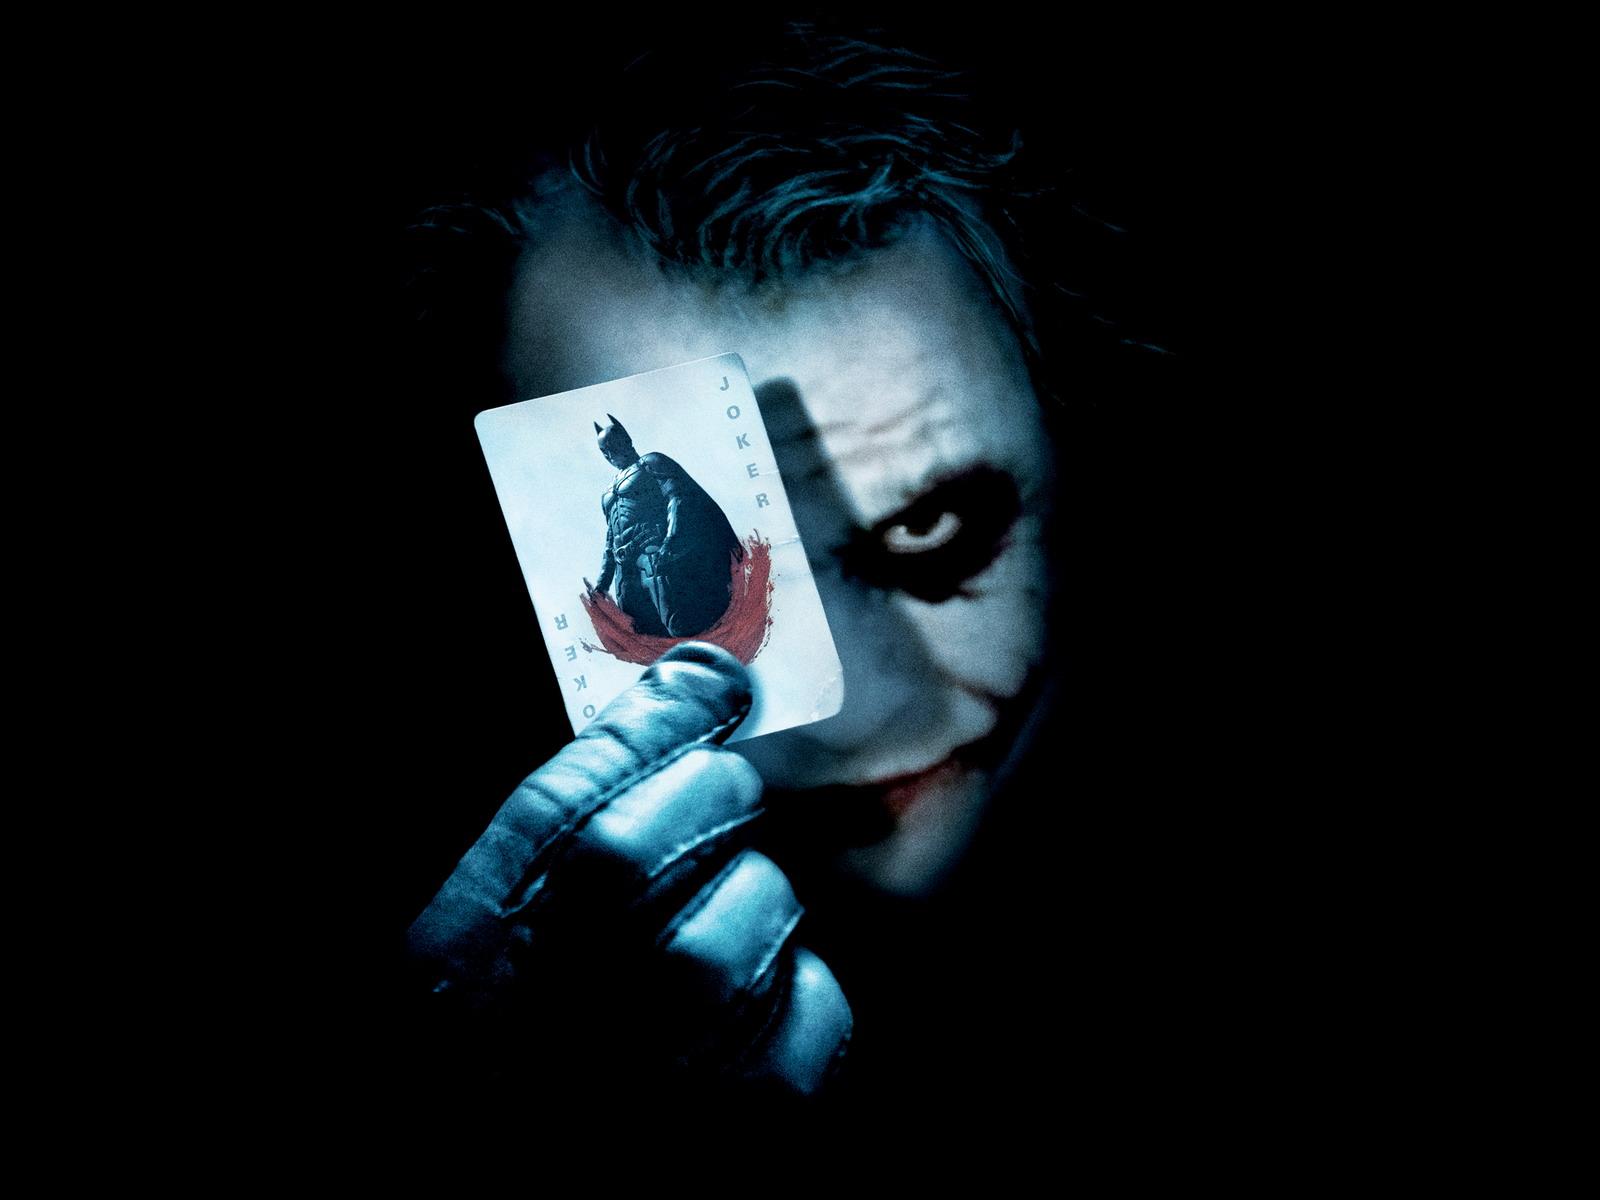 Joker wallpaper   The Joker Wallpaper 32054208 1600x1200